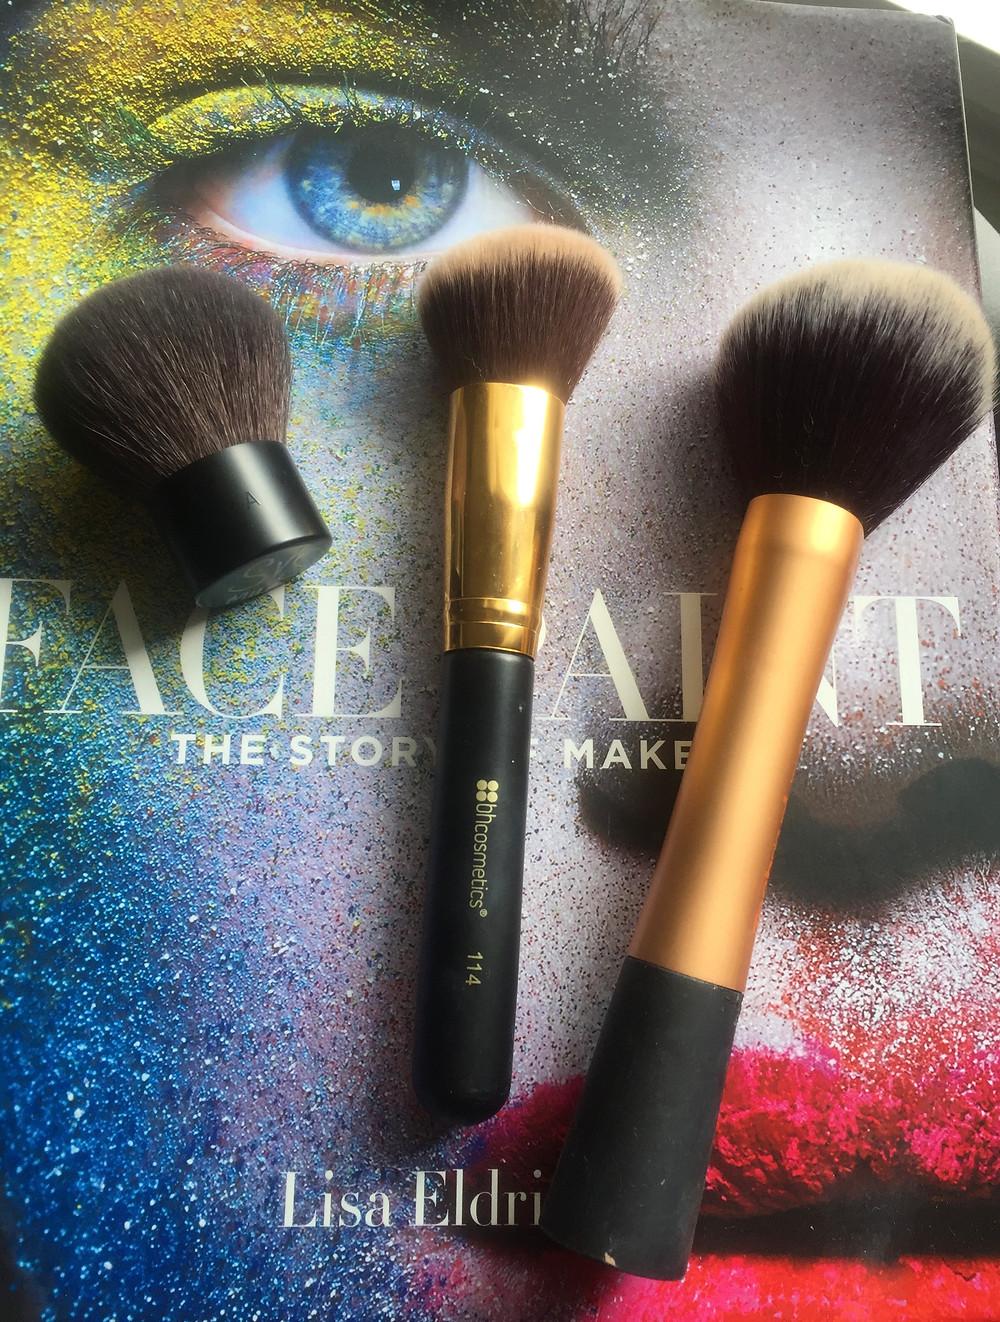 Beauty Blog Louisiana, Beauty Blog Shreveport, Blogger, Makeup Artist Louisiana, Makeup Artist Shreveport, Makeup Artist blog, MUA,